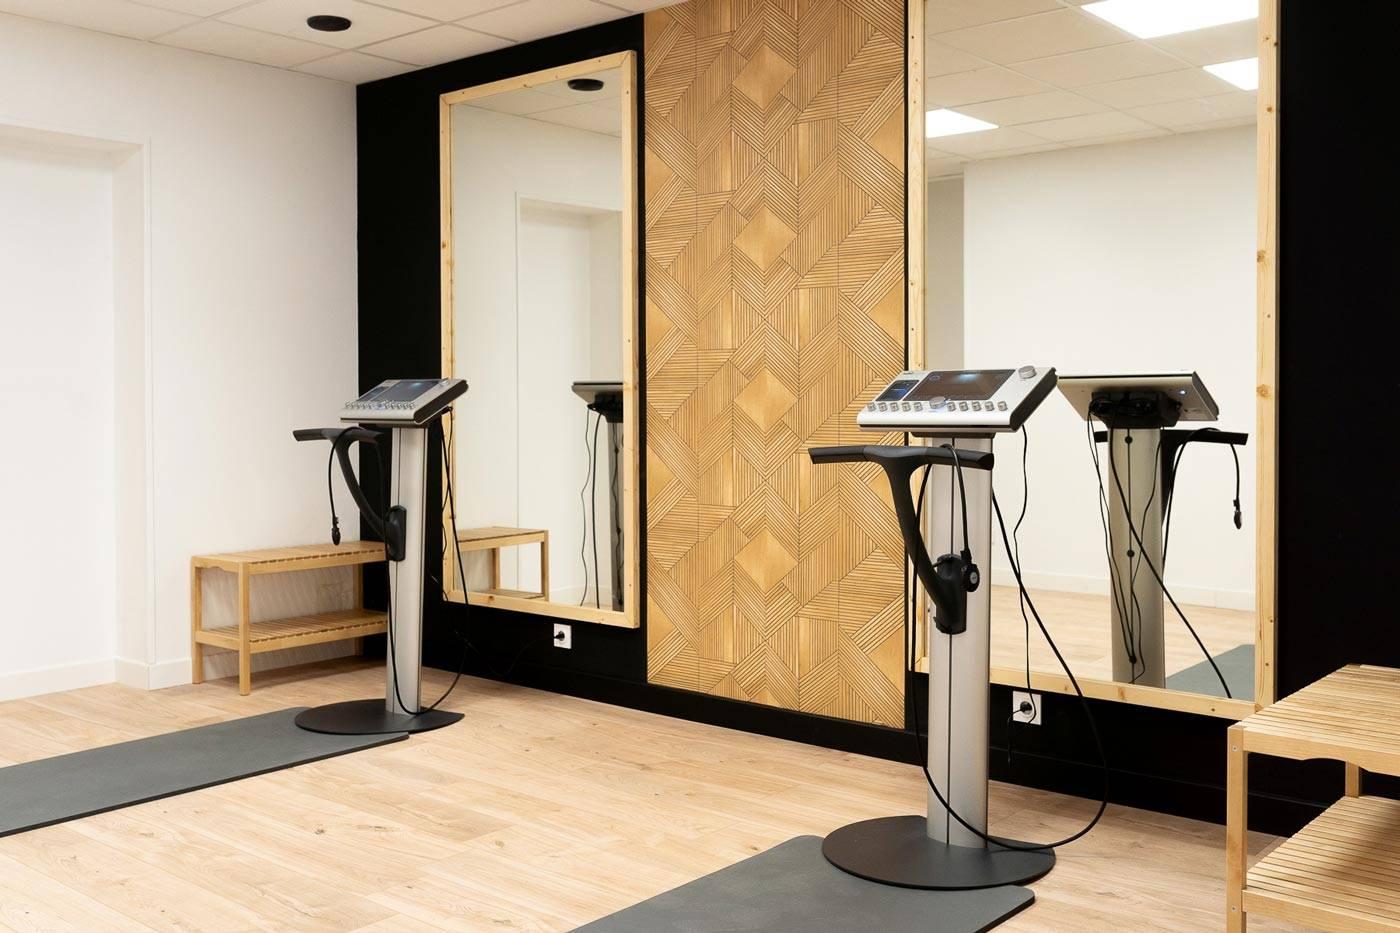 Studio électrostimulation rennes fit agency machine miha bodytec